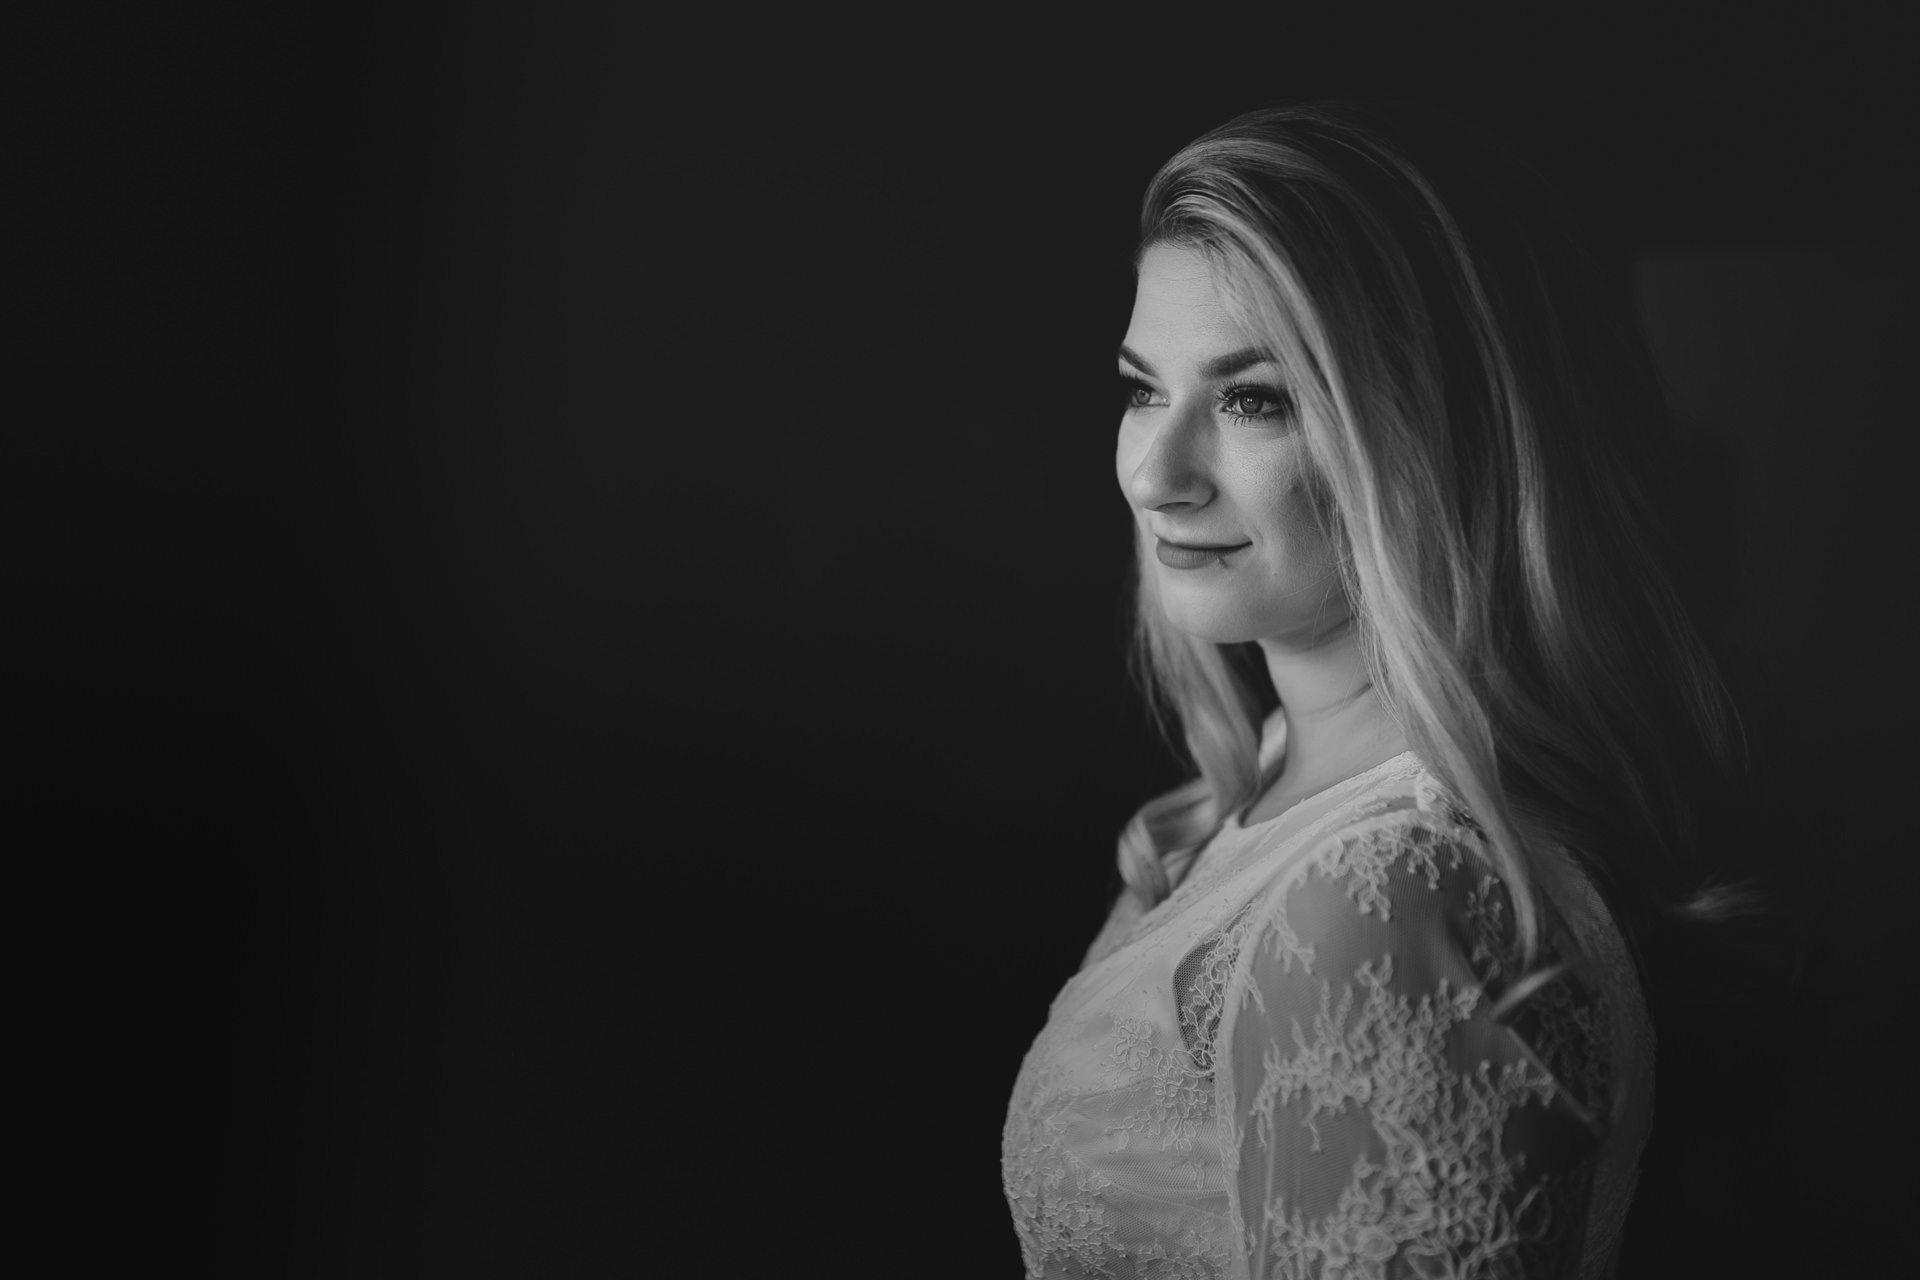 hamilton-wedding-portrait-photographer-kf-107